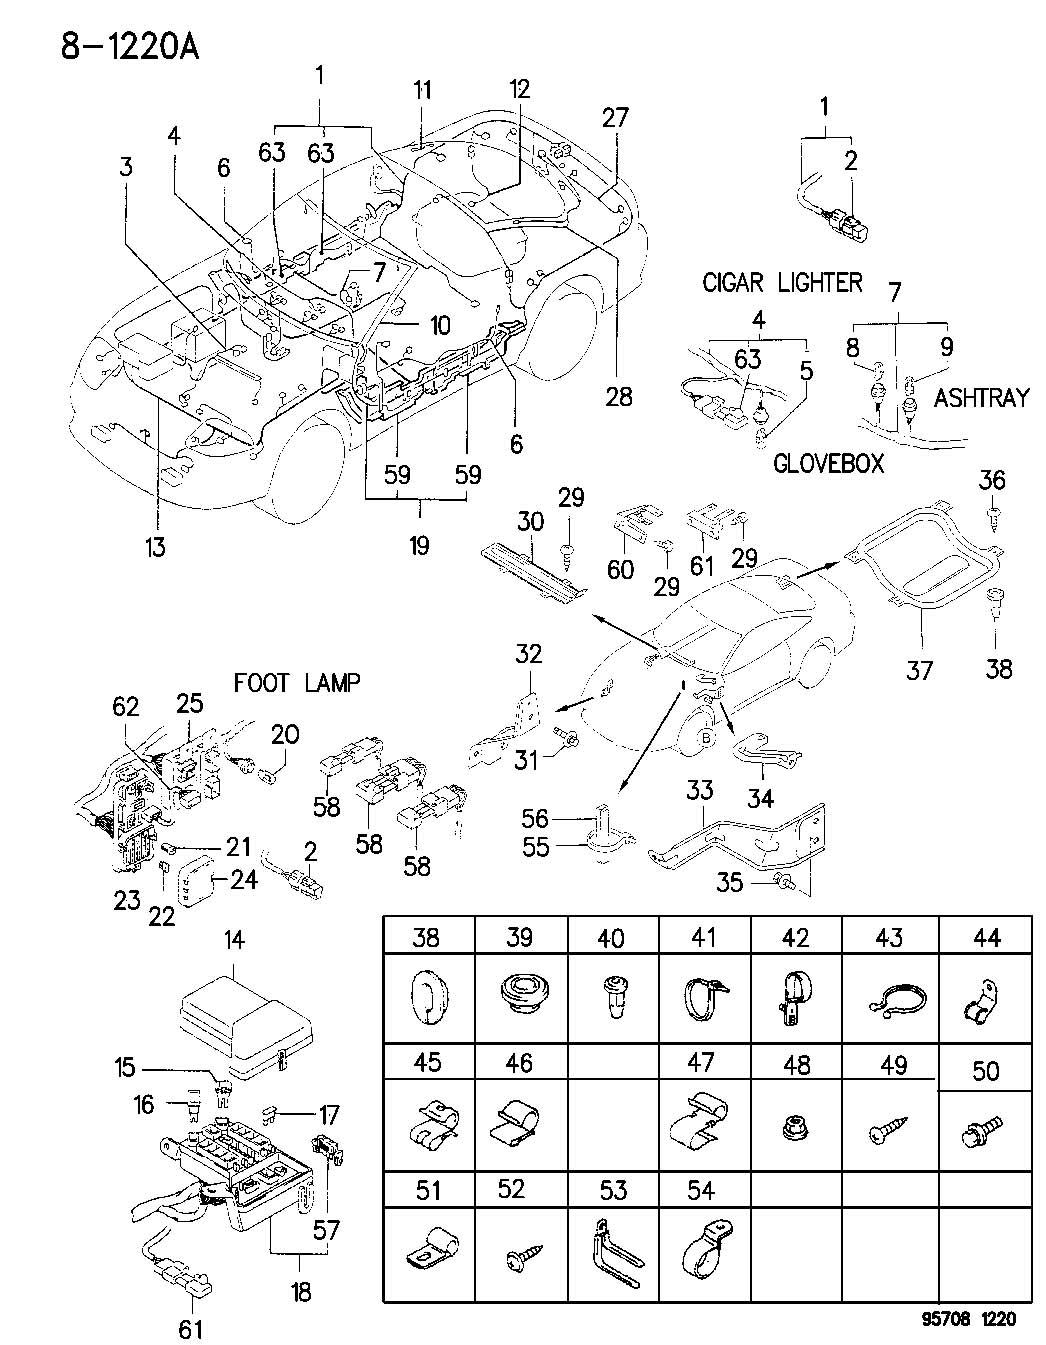 1995 Eagle Talon 2 0 Wiring Diagrams